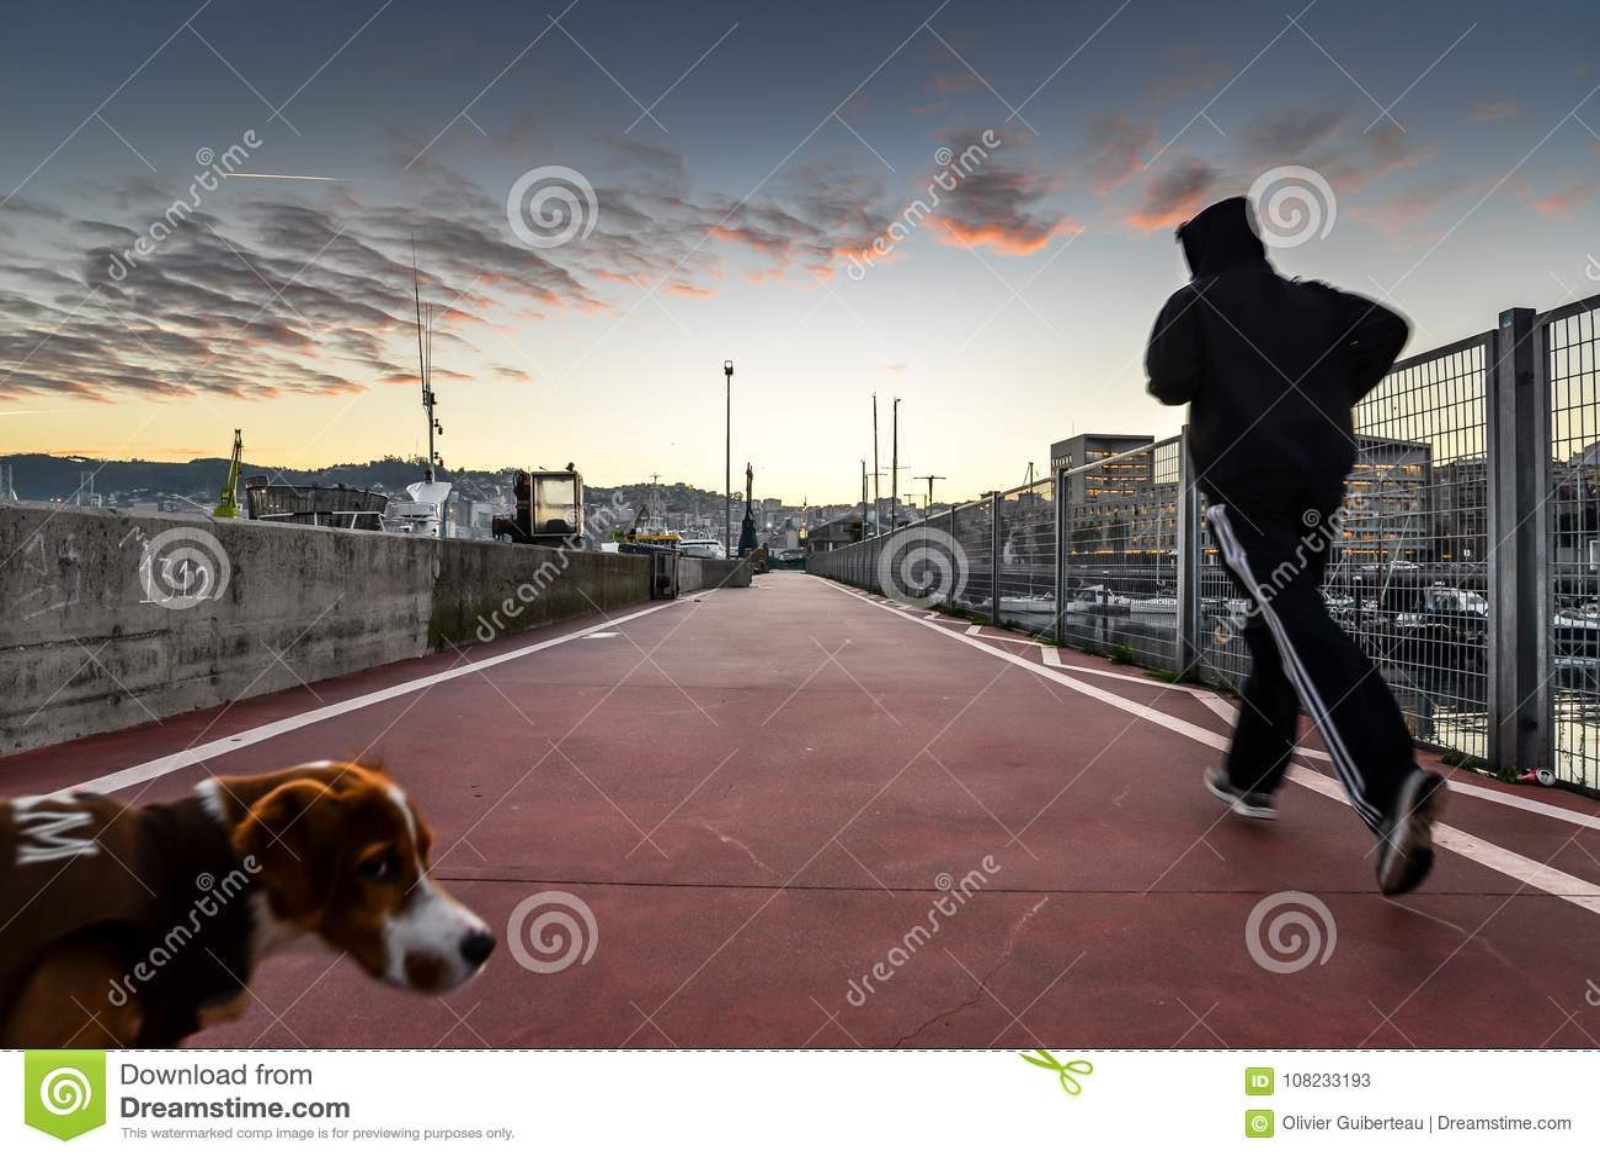 Matin couru à Vigo - en Espagne